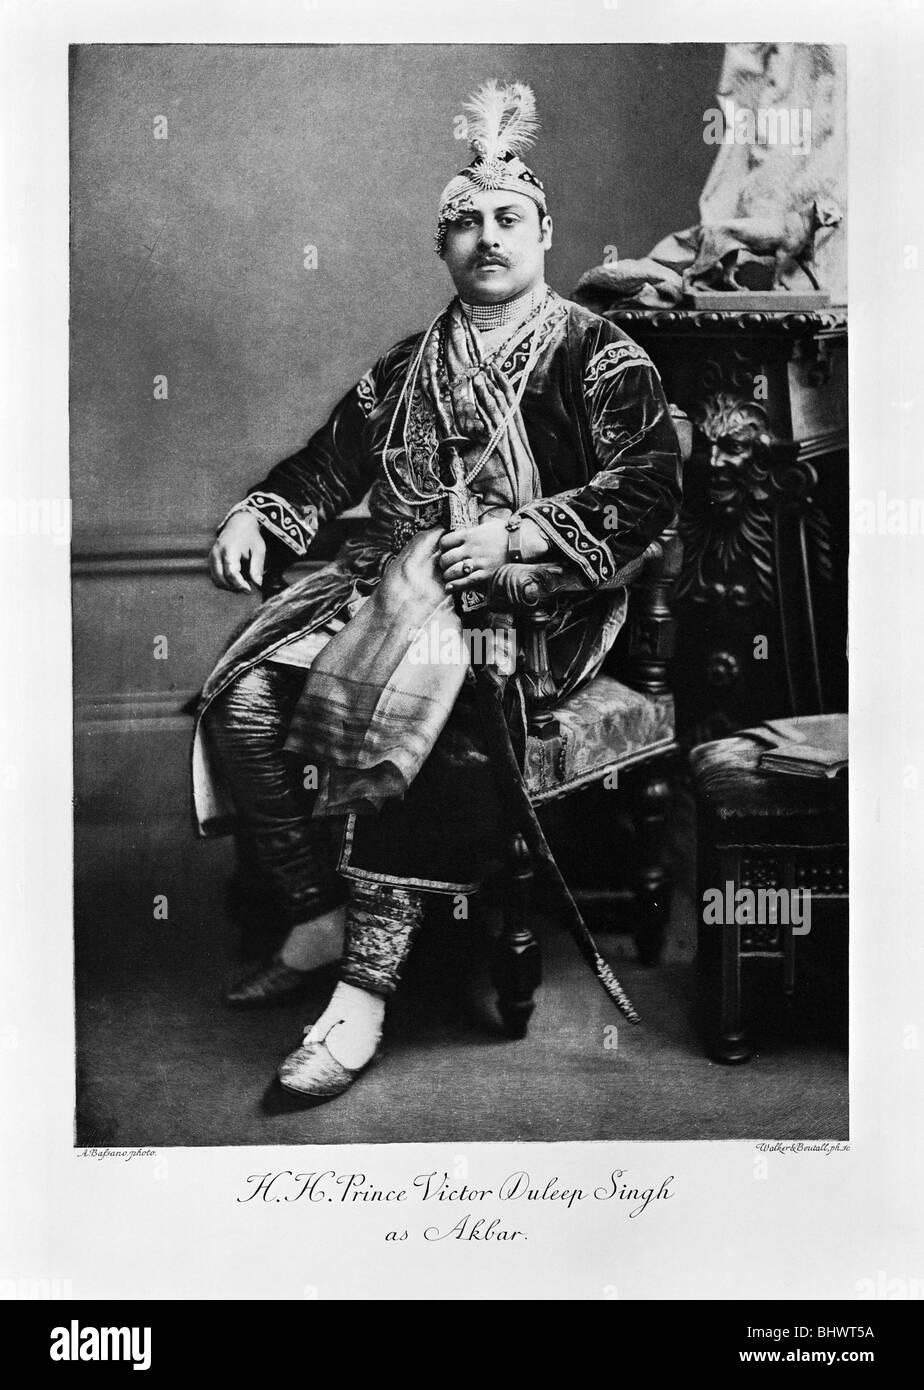 HH Prince Victor Duleep Singh as Akbar, c1900. - Stock Image